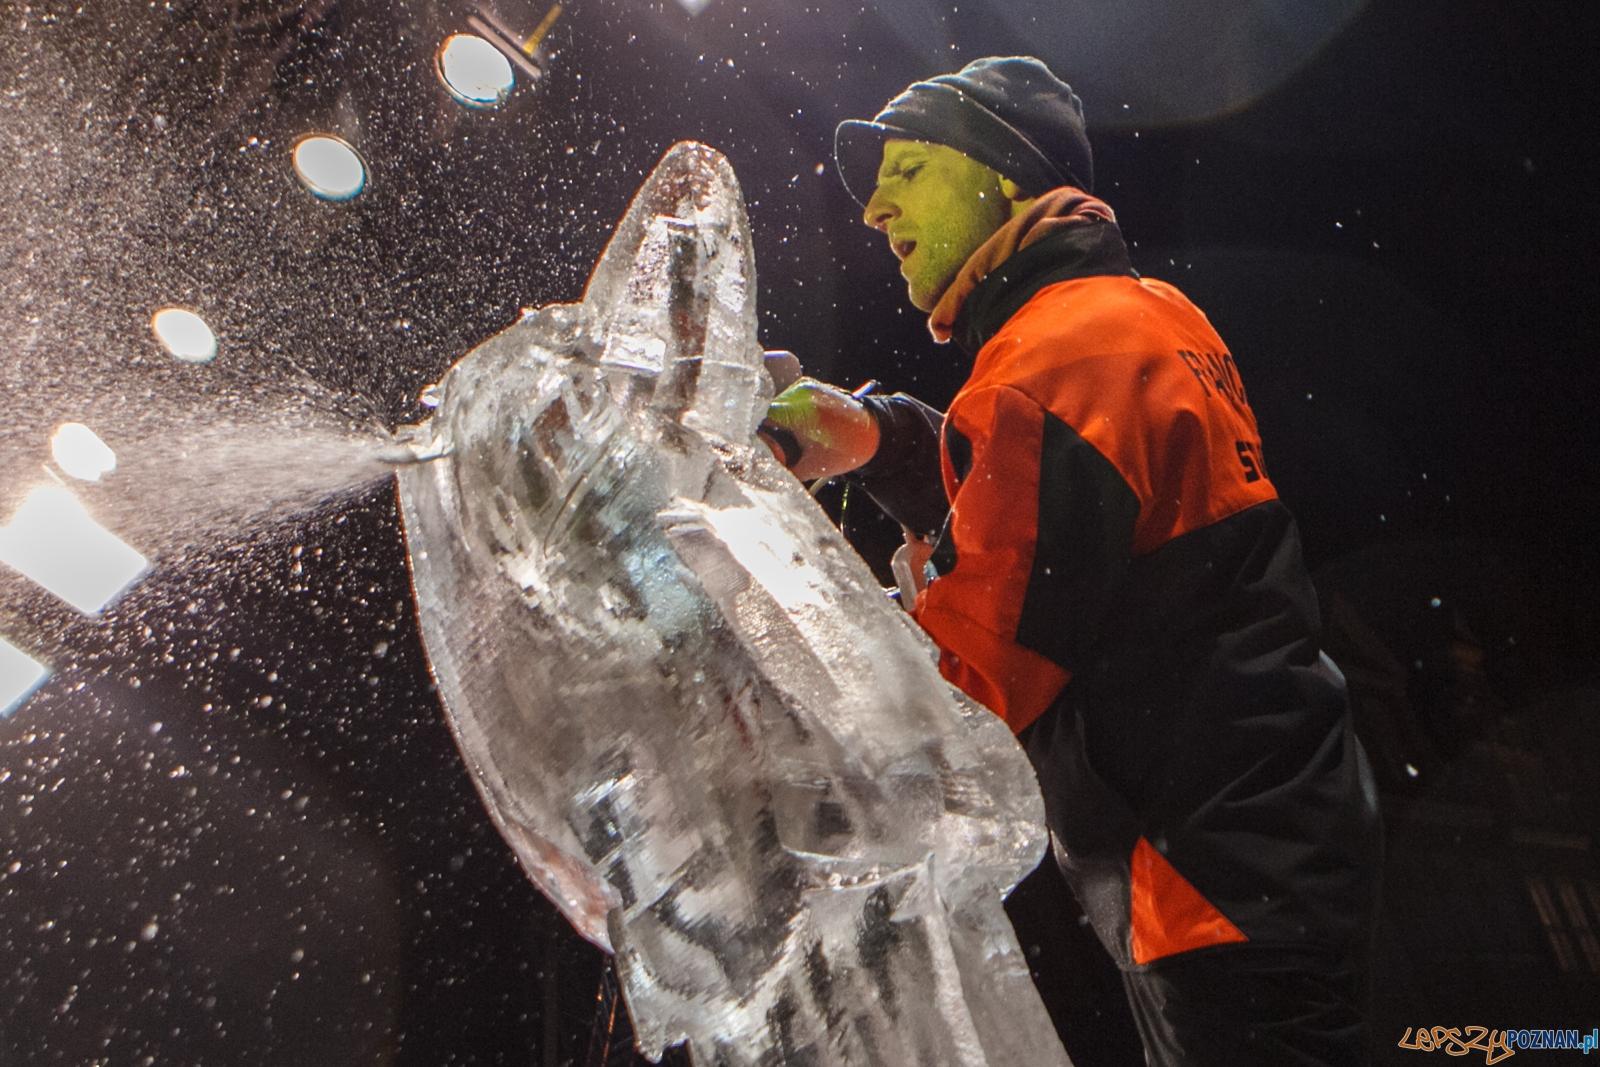 STIHL POZnan Ice Festival 2015 - 12.12.2015 r.  Foto: LepszyPOZNAN.pl / Paweł Rychter